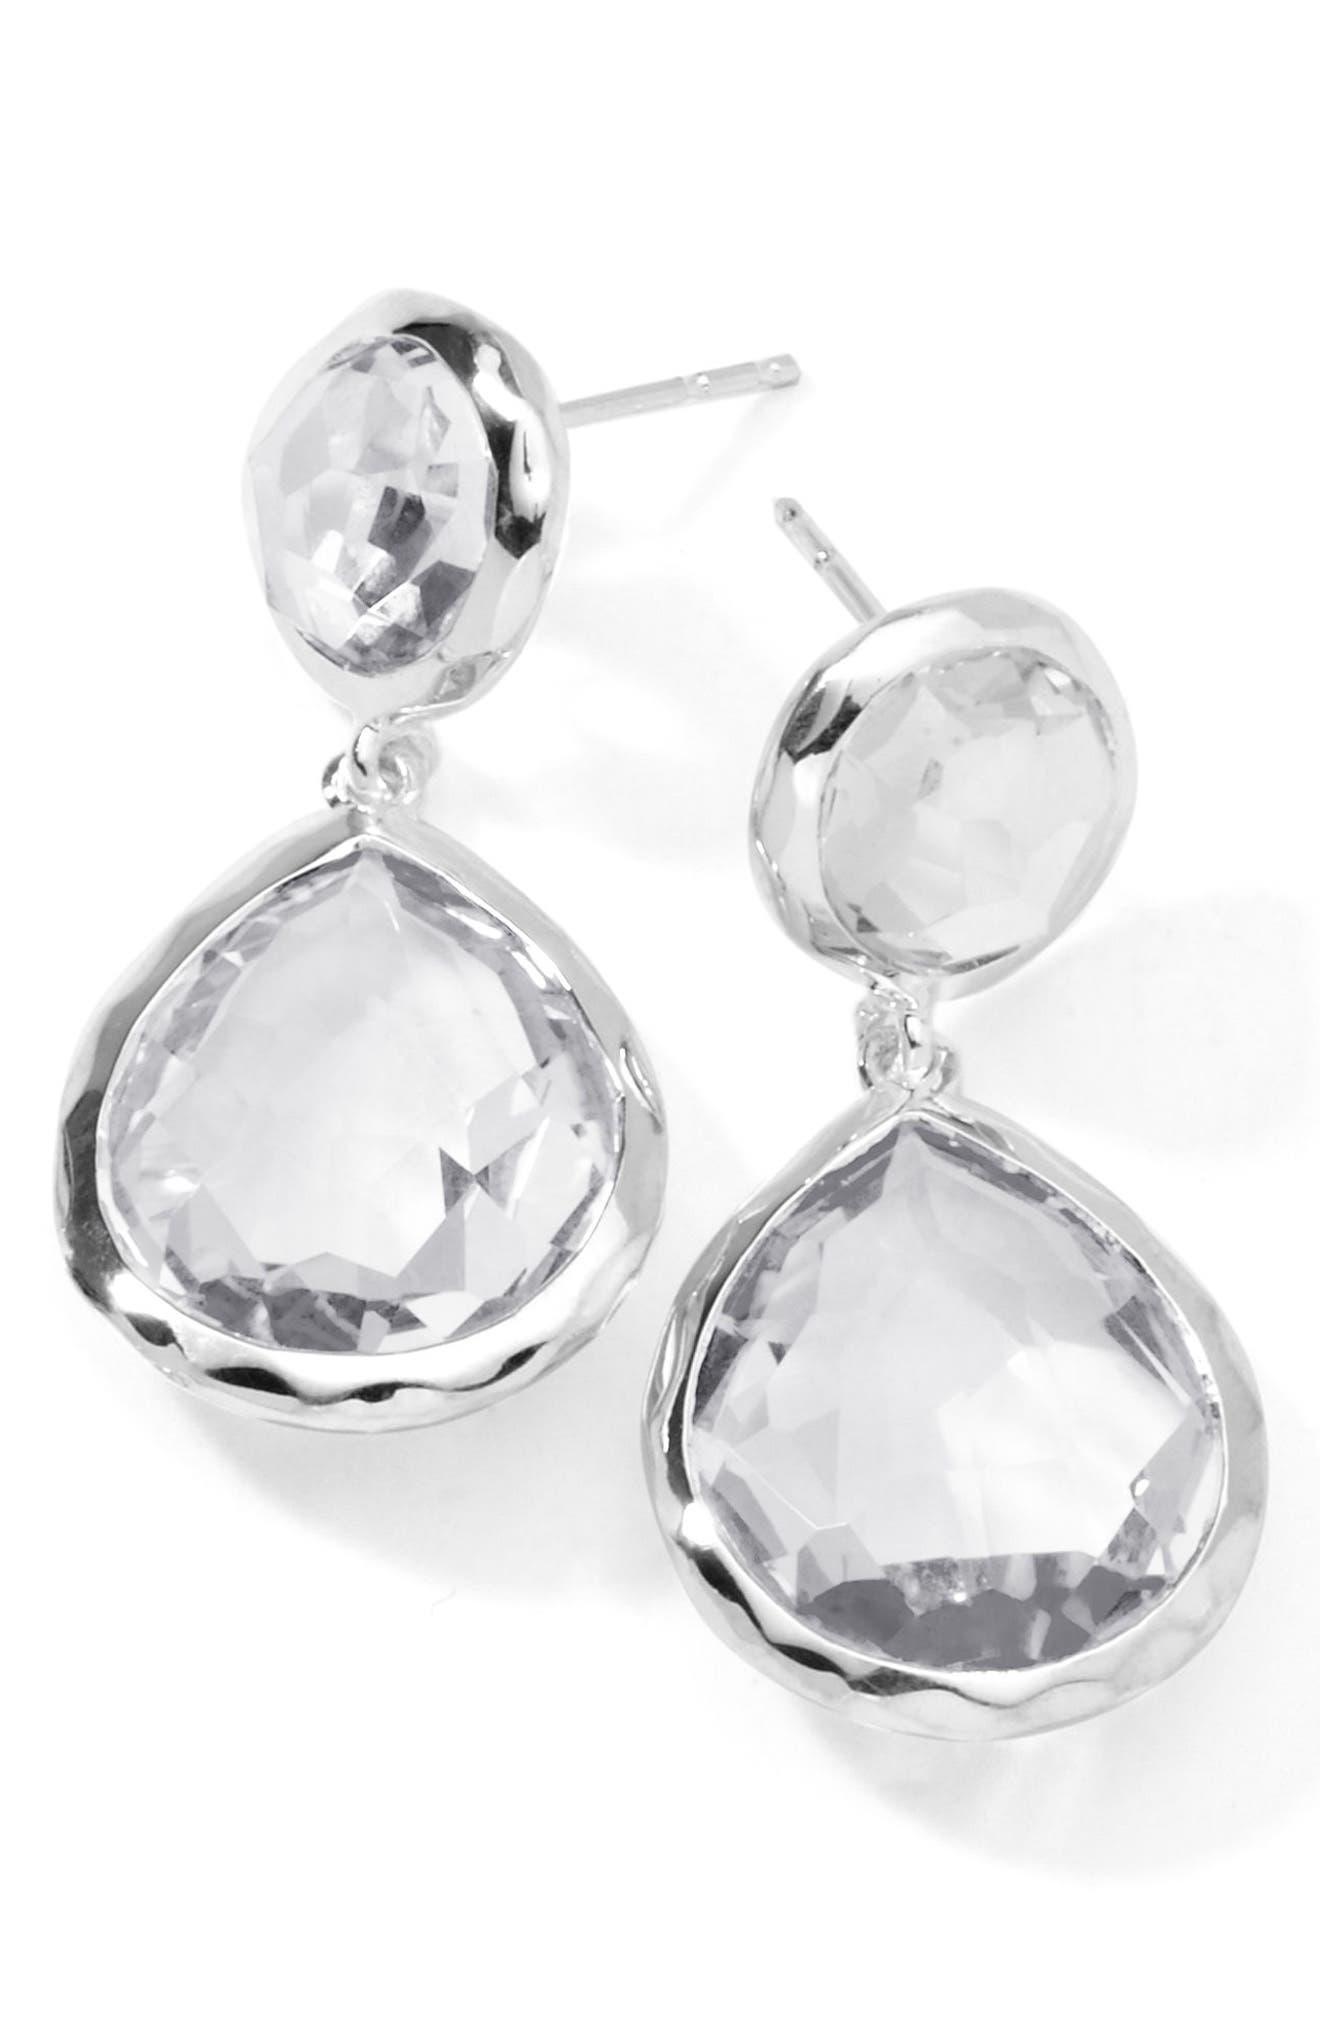 'Rock Candy - Snowman' Drop Earrings,                         Main,                         color, Silver/Clear Quartz